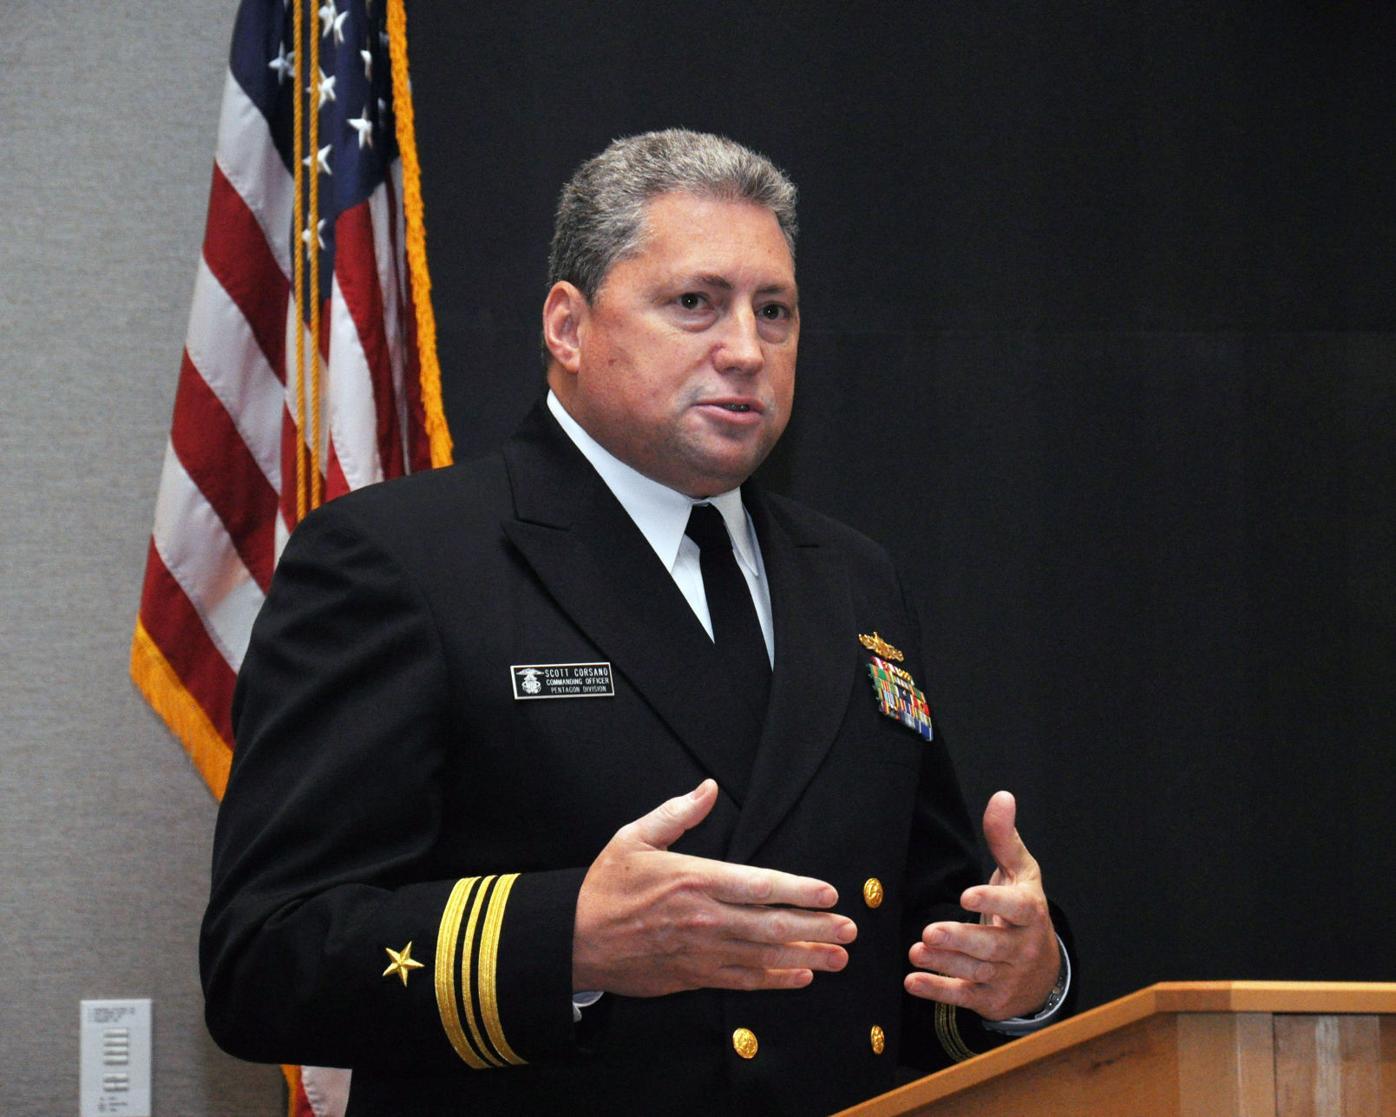 Lt. Cmdr. Scott Corsano